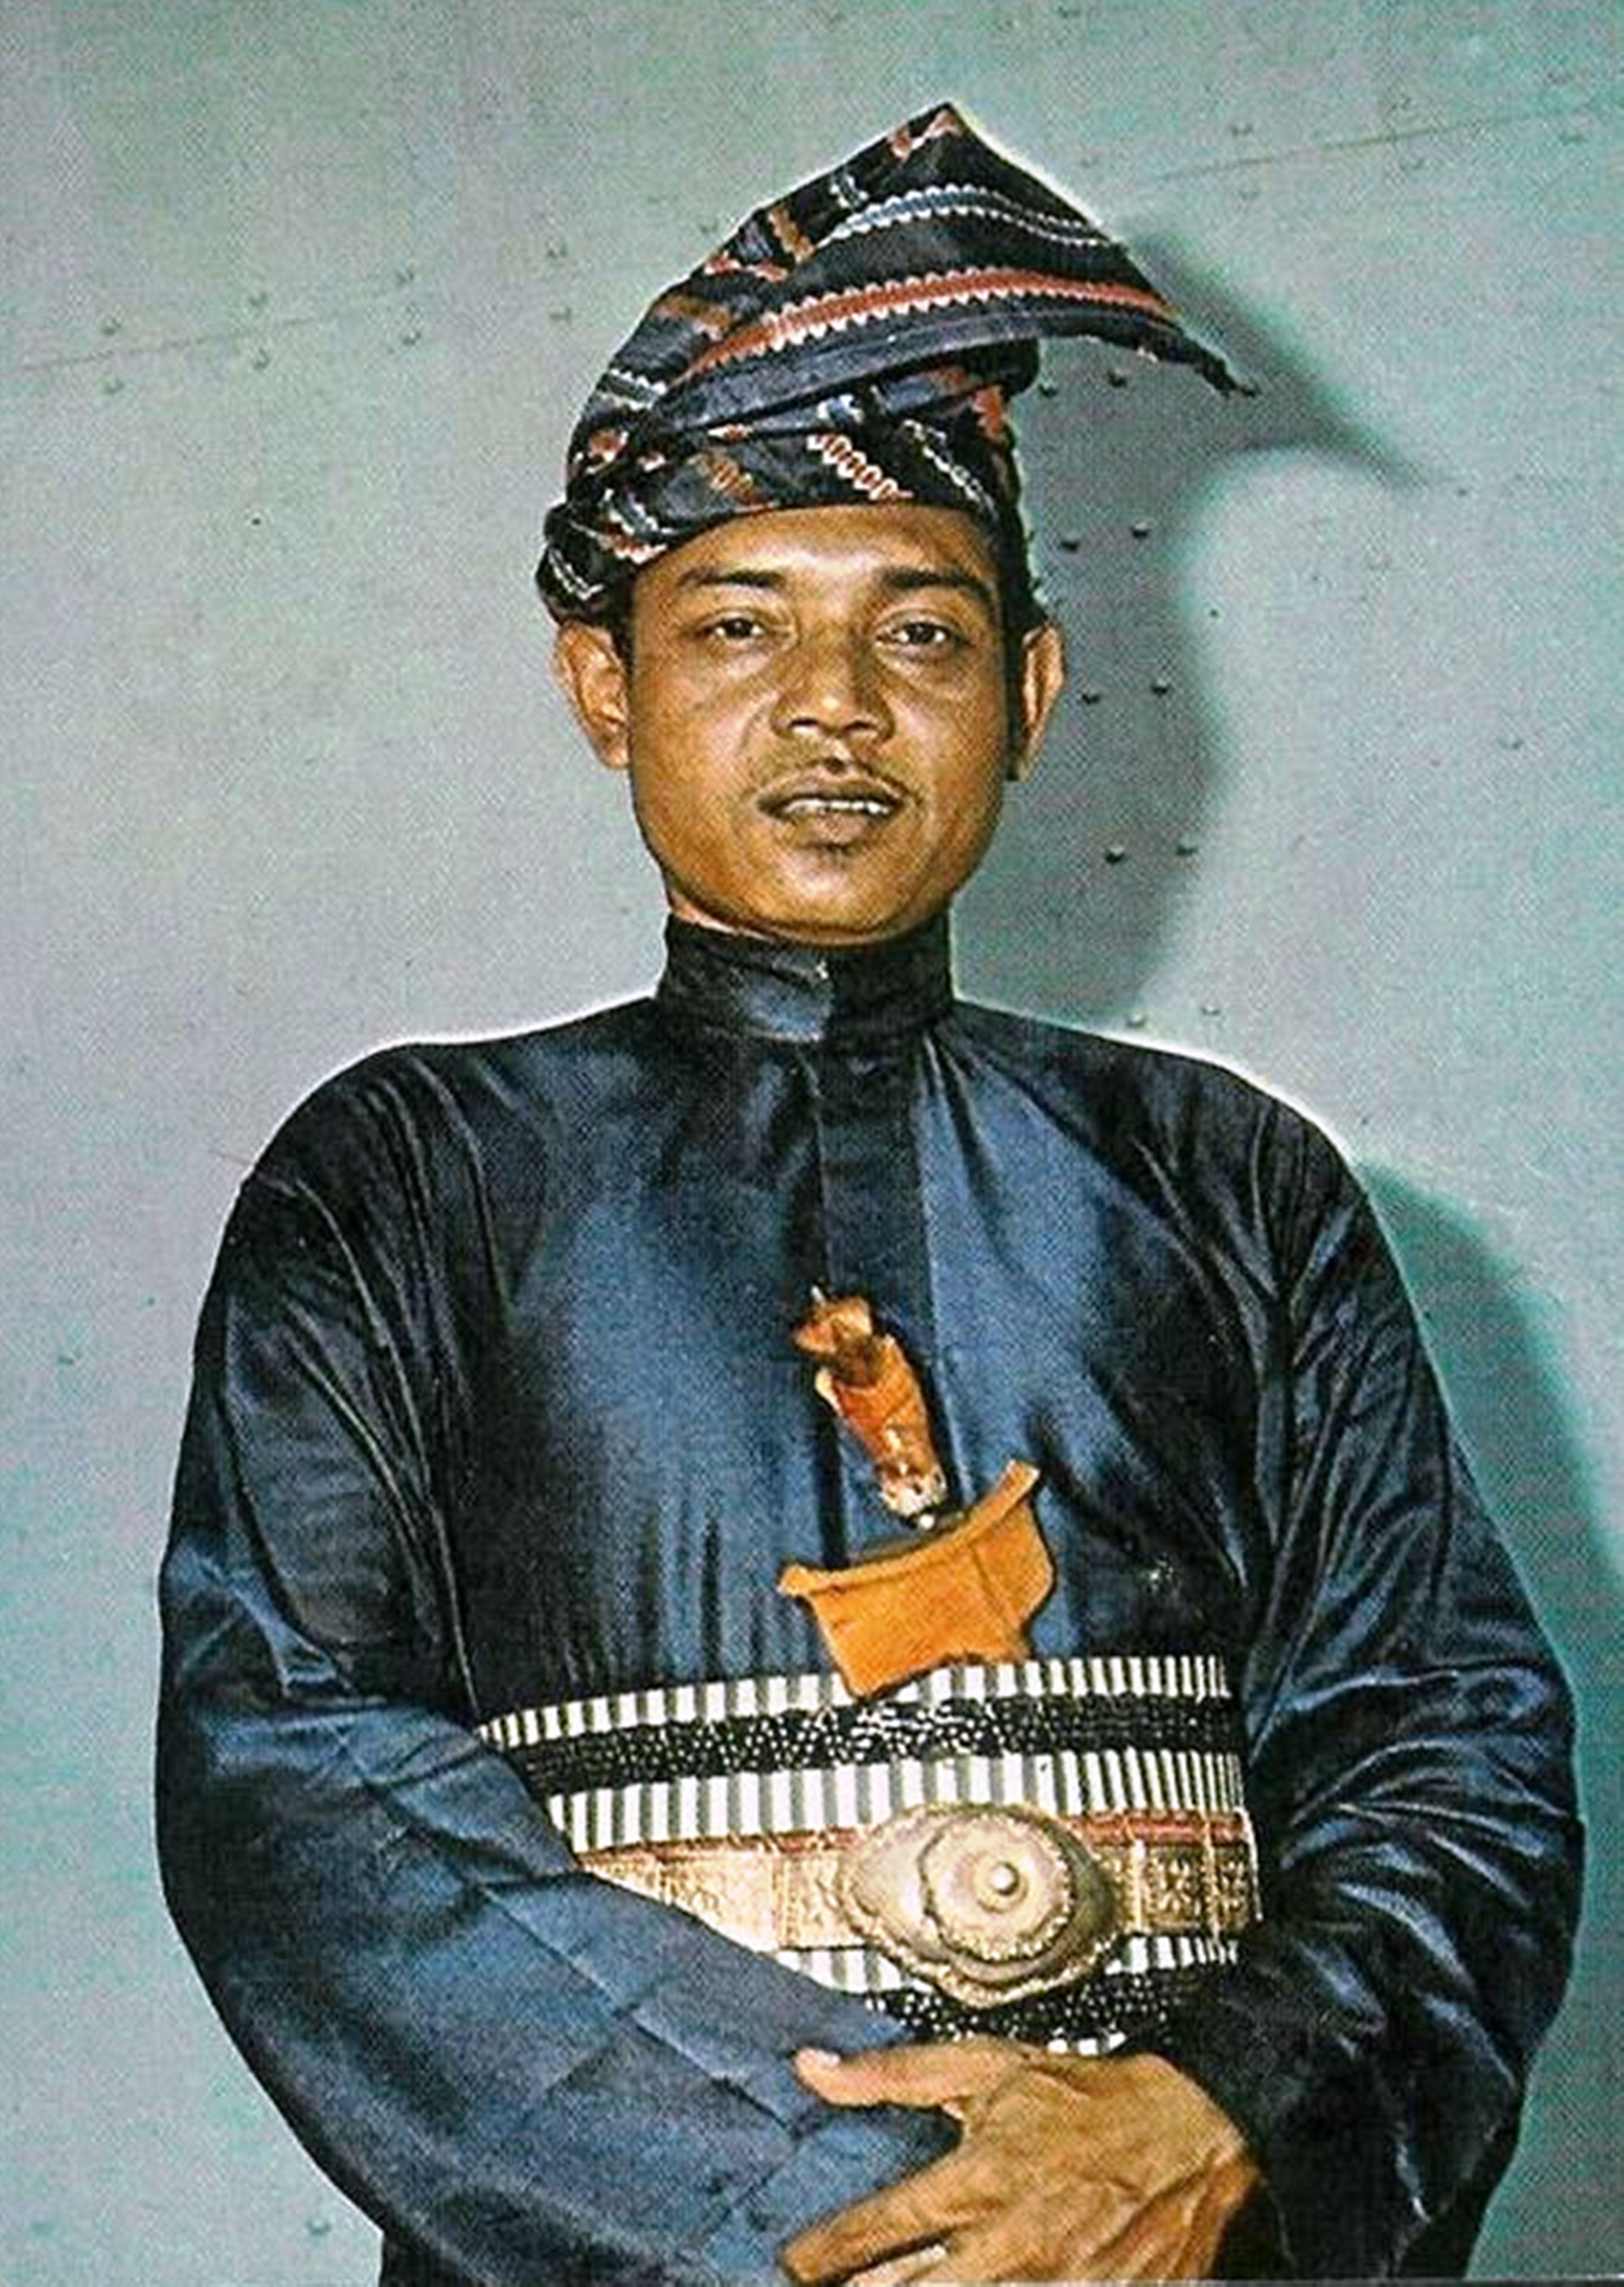 Actor Arwahyarham Noordin Ahmad in Malay regalia